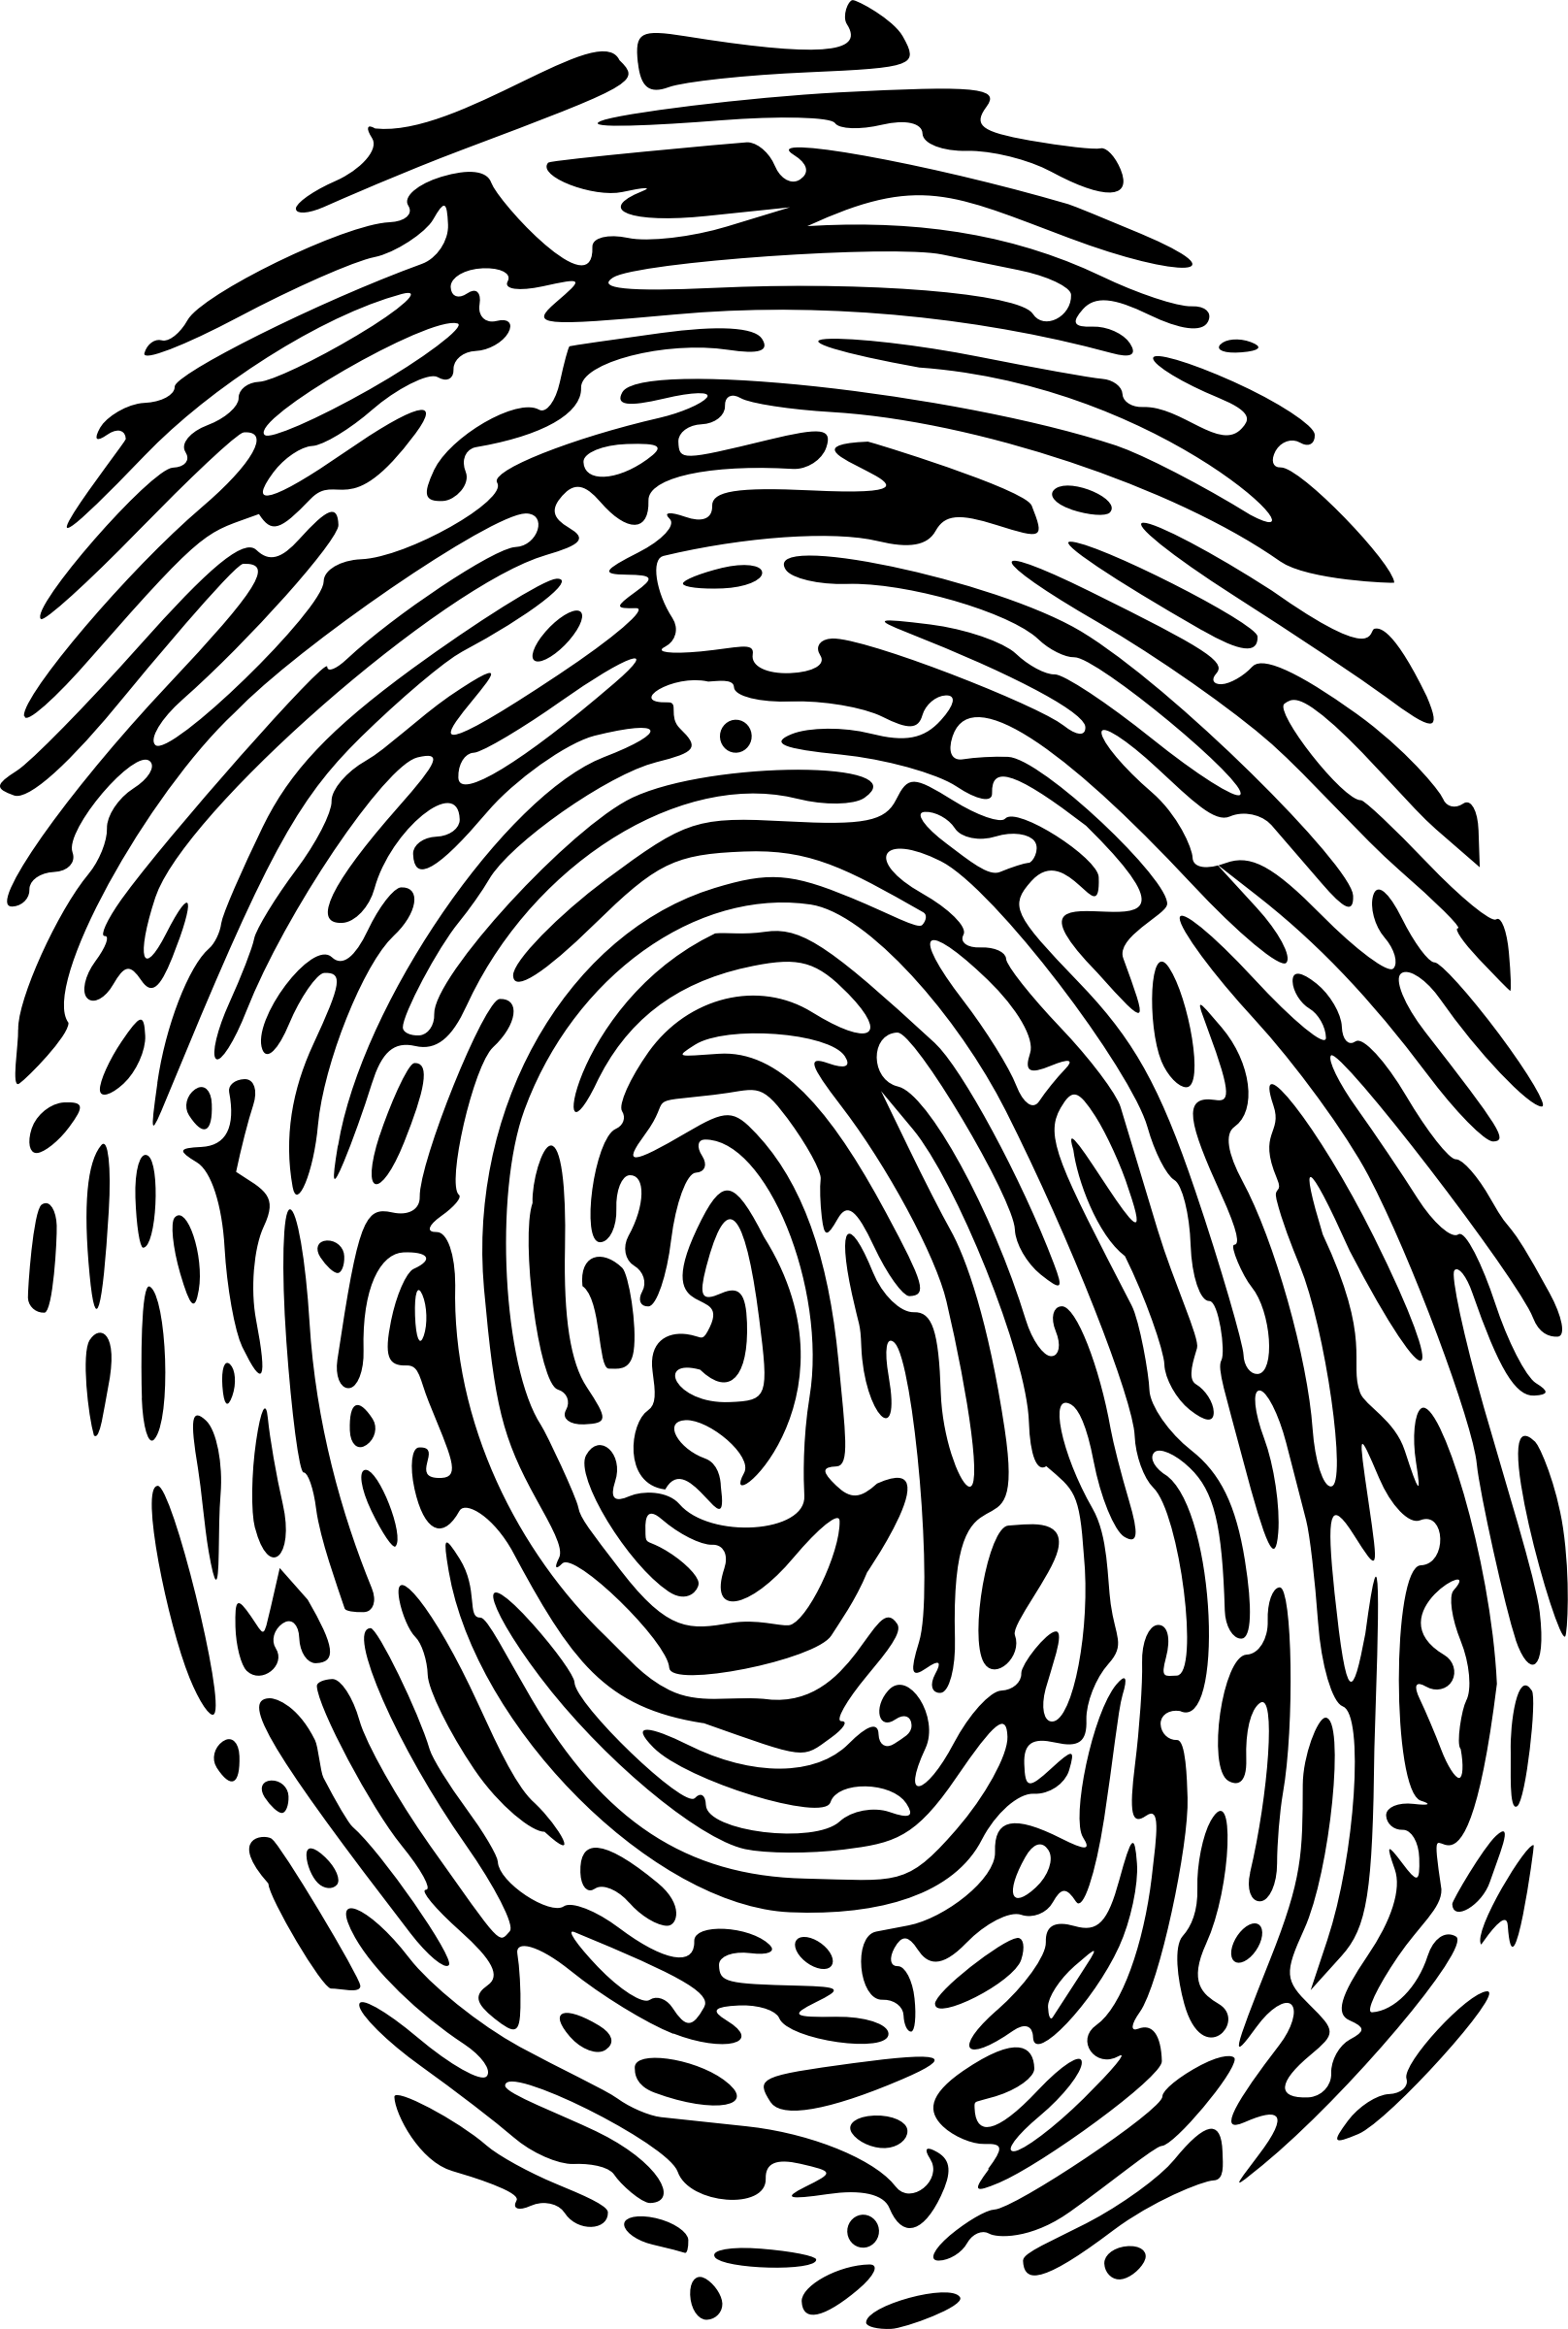 Thumbprint Vector